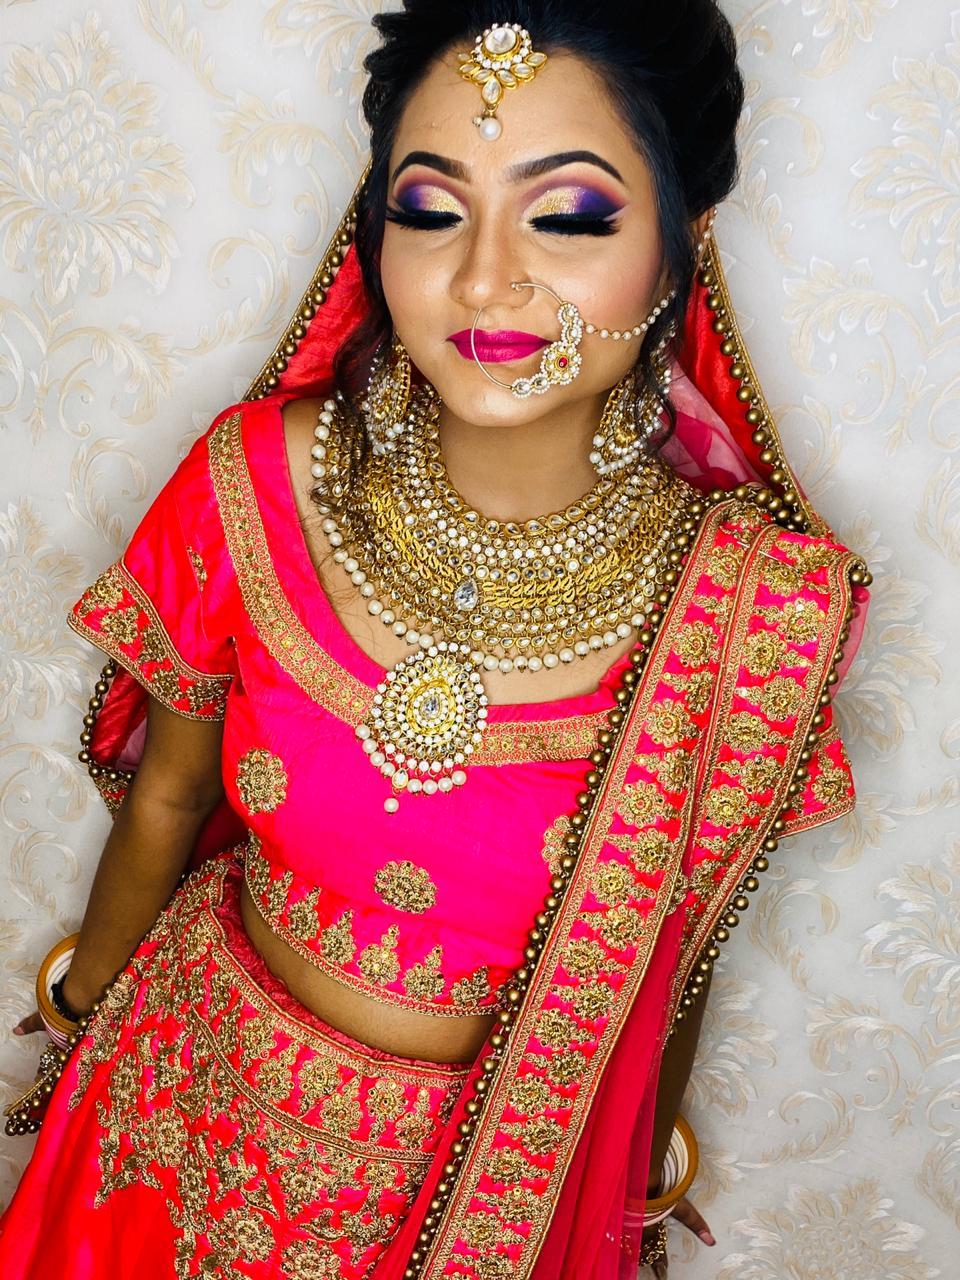 pooja-gupta-makeup-artist-delhi-ncr